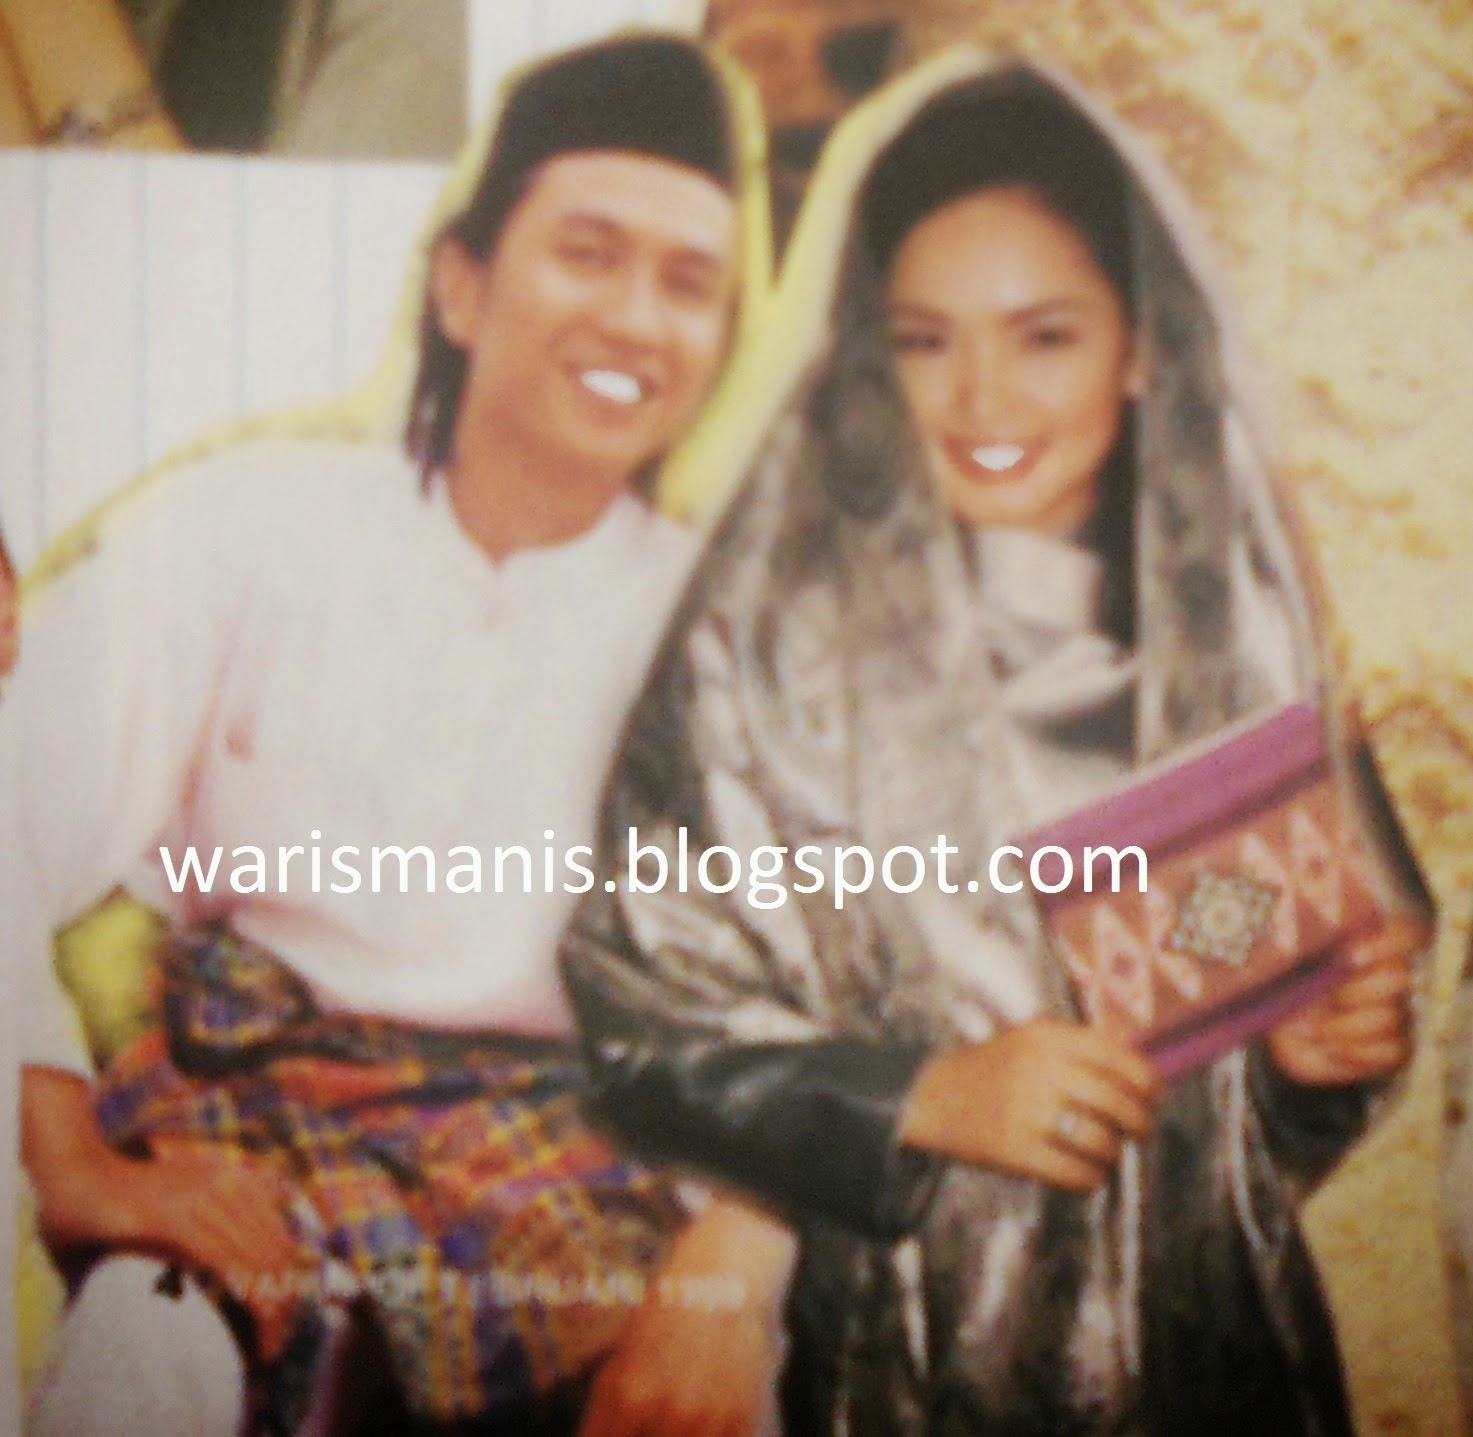 Dato' Siti Nurhaliza Pernah Bekalkan Zamani Ikan Bilis?, info, terkini, hiburan, sensasi, gossip, siti nurhaliza, zamani slam, kontroversi,